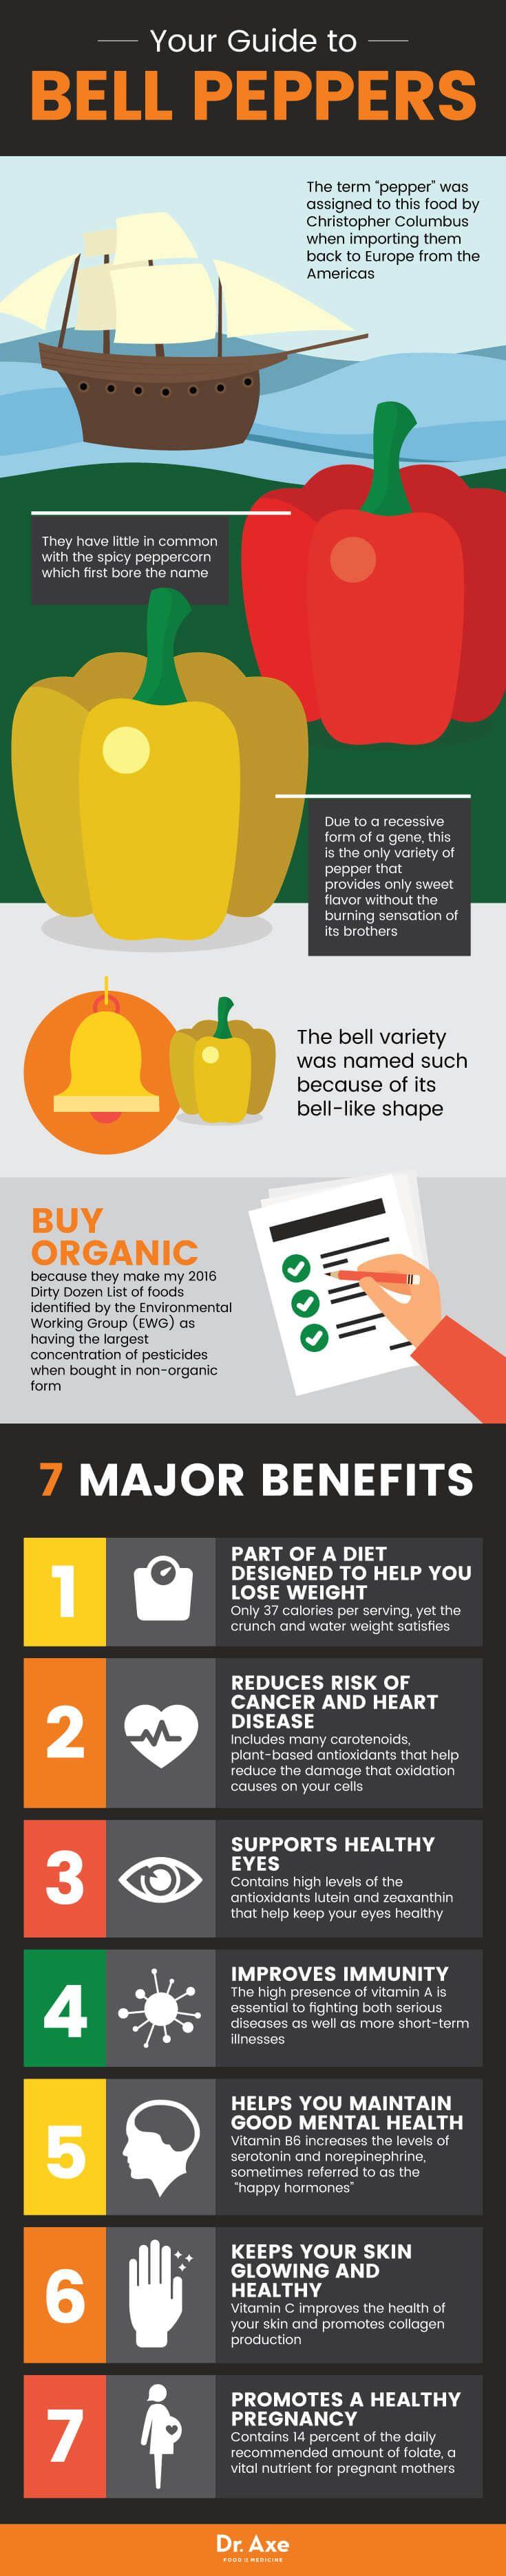 Bell pepper benefits - Dr. Axe http://www.draxe.com #health #holistic #natural